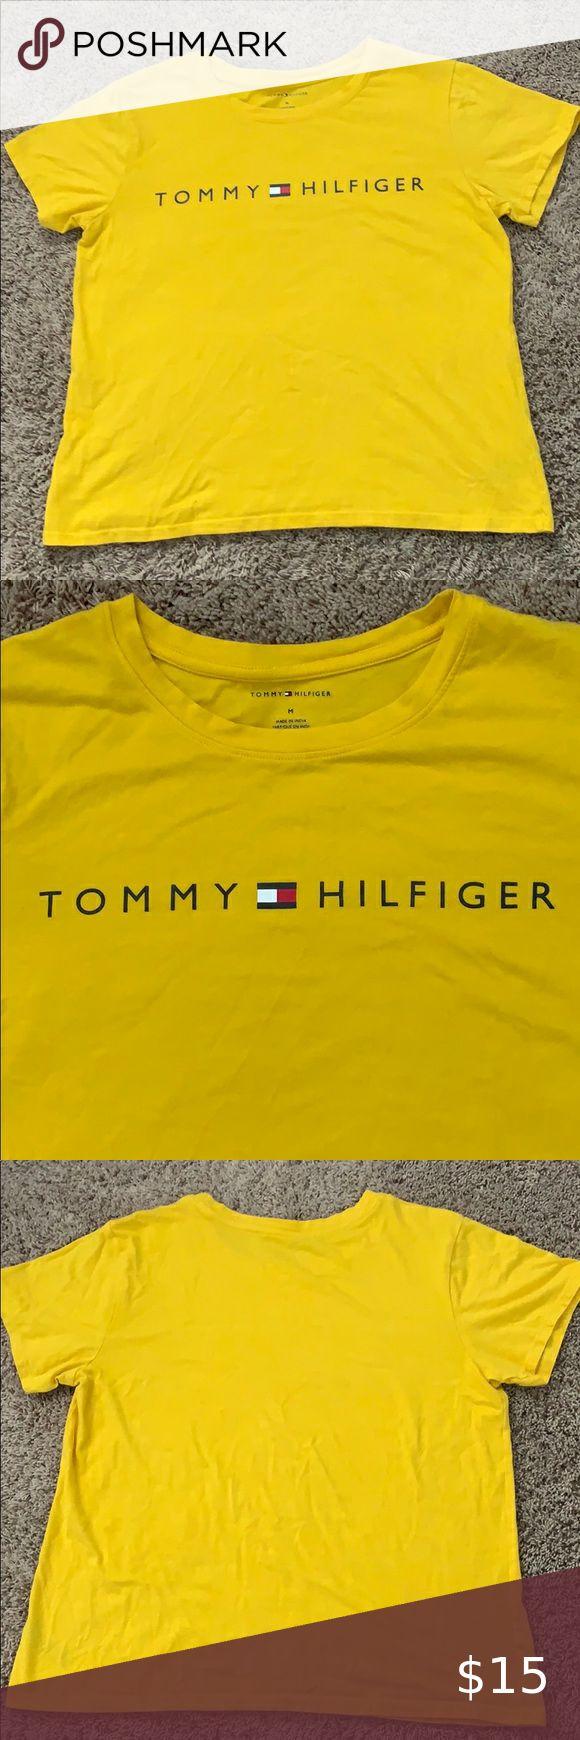 Original Yellow Tommy Hilfiger TShirt in 2020 Tommy